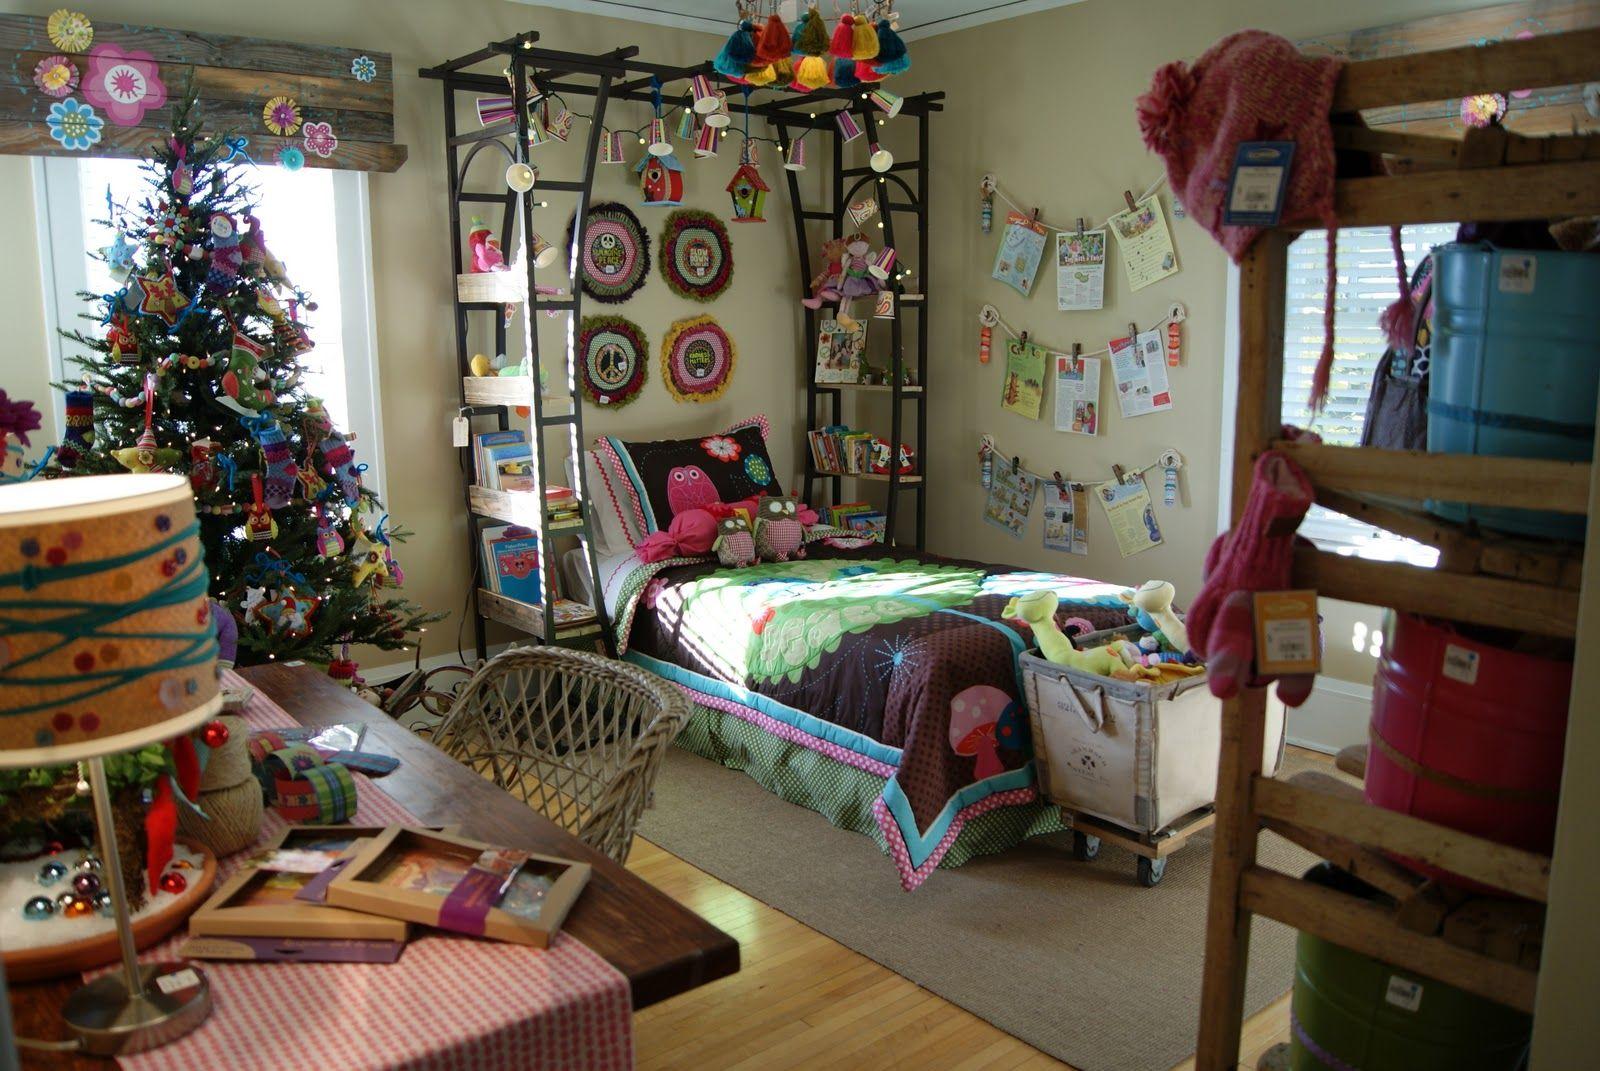 High quality bohemian decorating ideas bohemian - Decoracion hippie habitacion ...